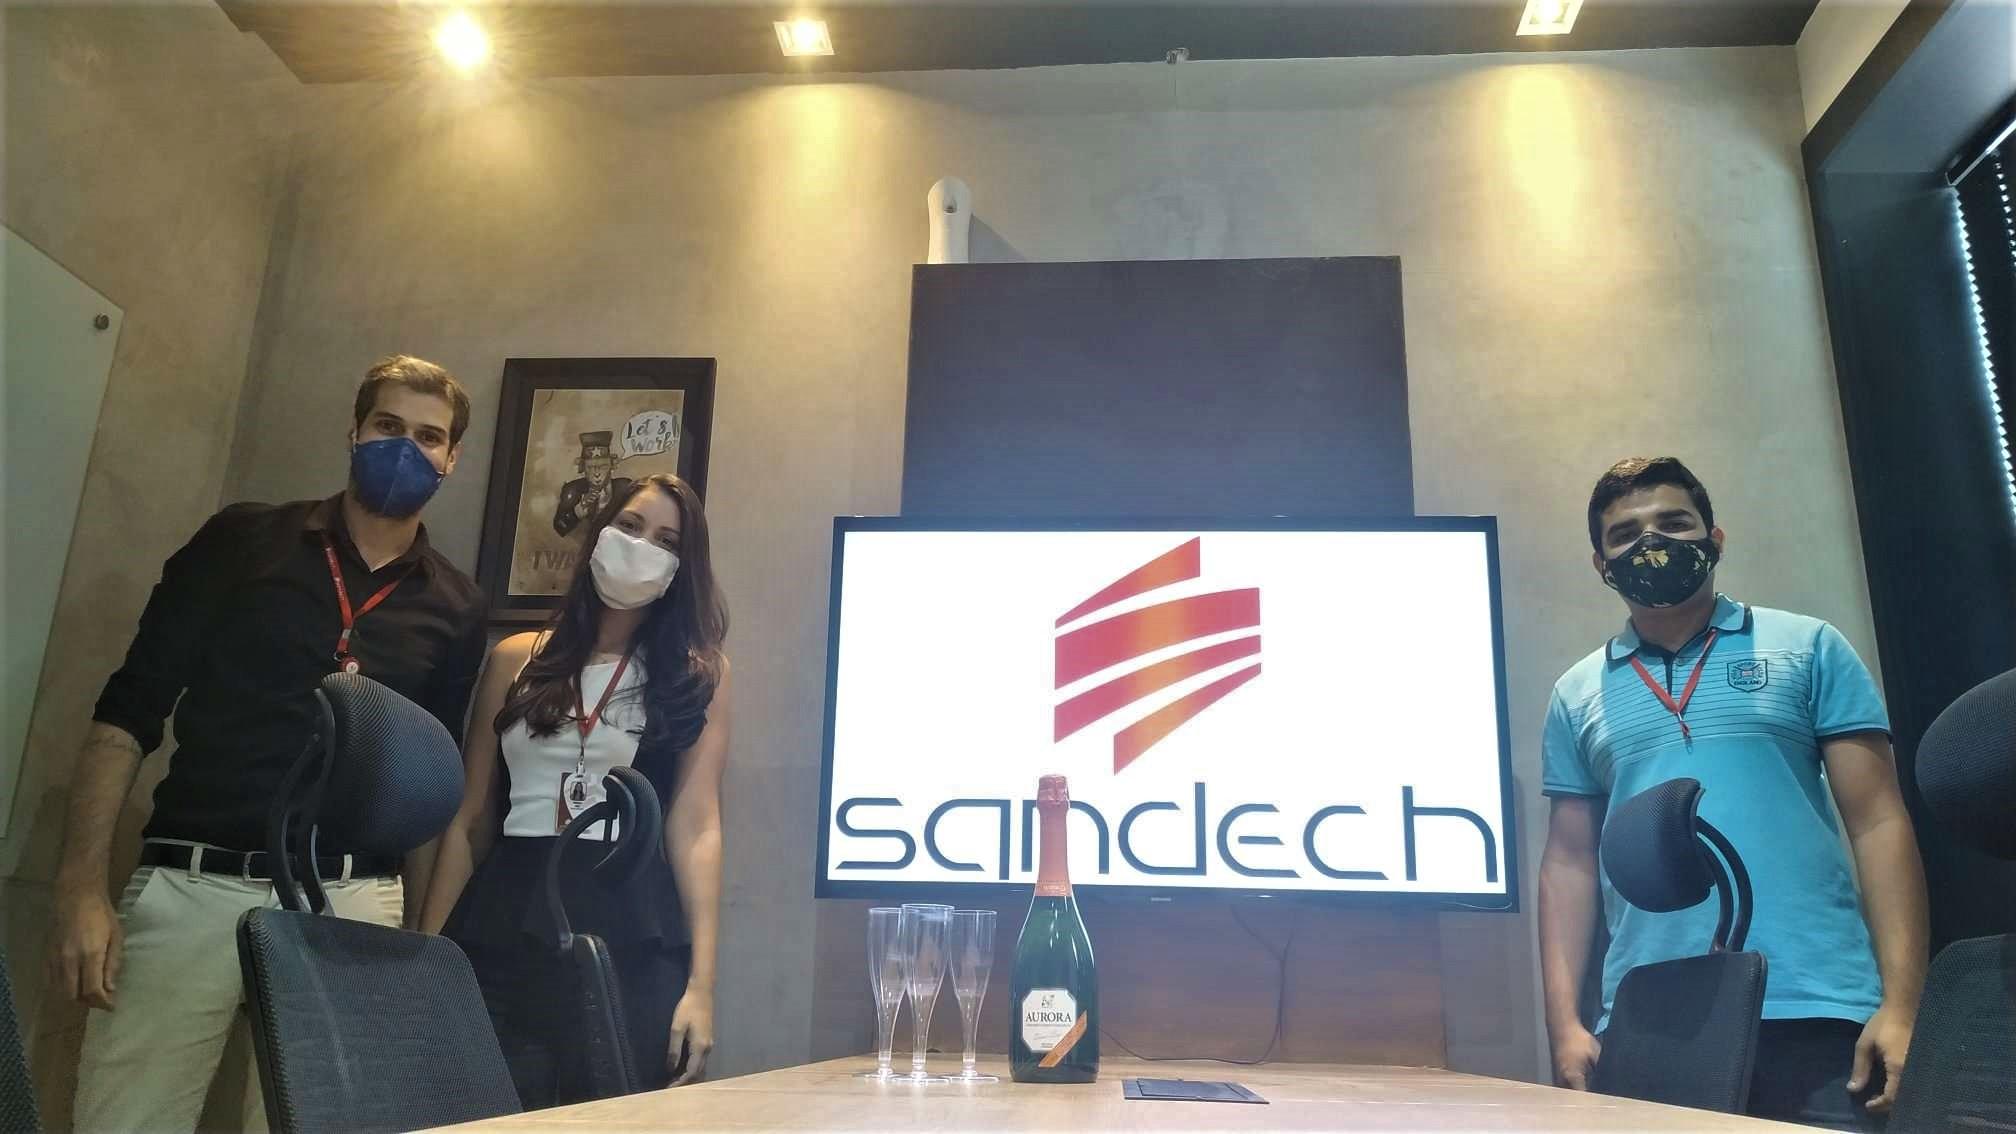 SANDECH